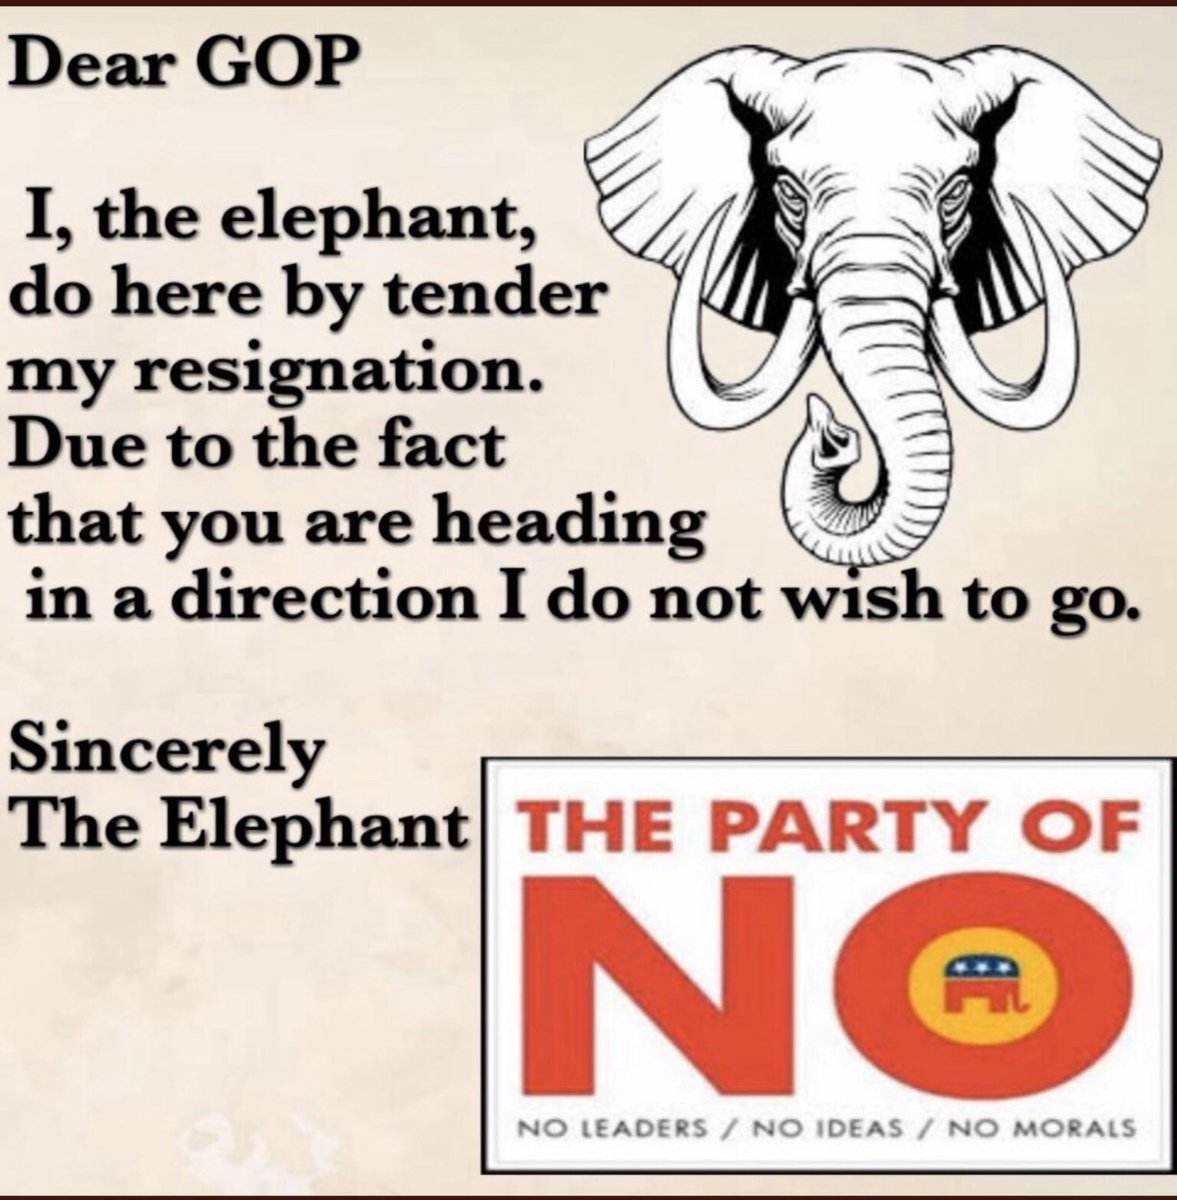 @RepsForBiden Time to rename and rebrand the Republican Party #GOP #GOPComplicitTraitors hear ye, hear ye on #BidenWonDay #BidenHarris #BuildBackBetter